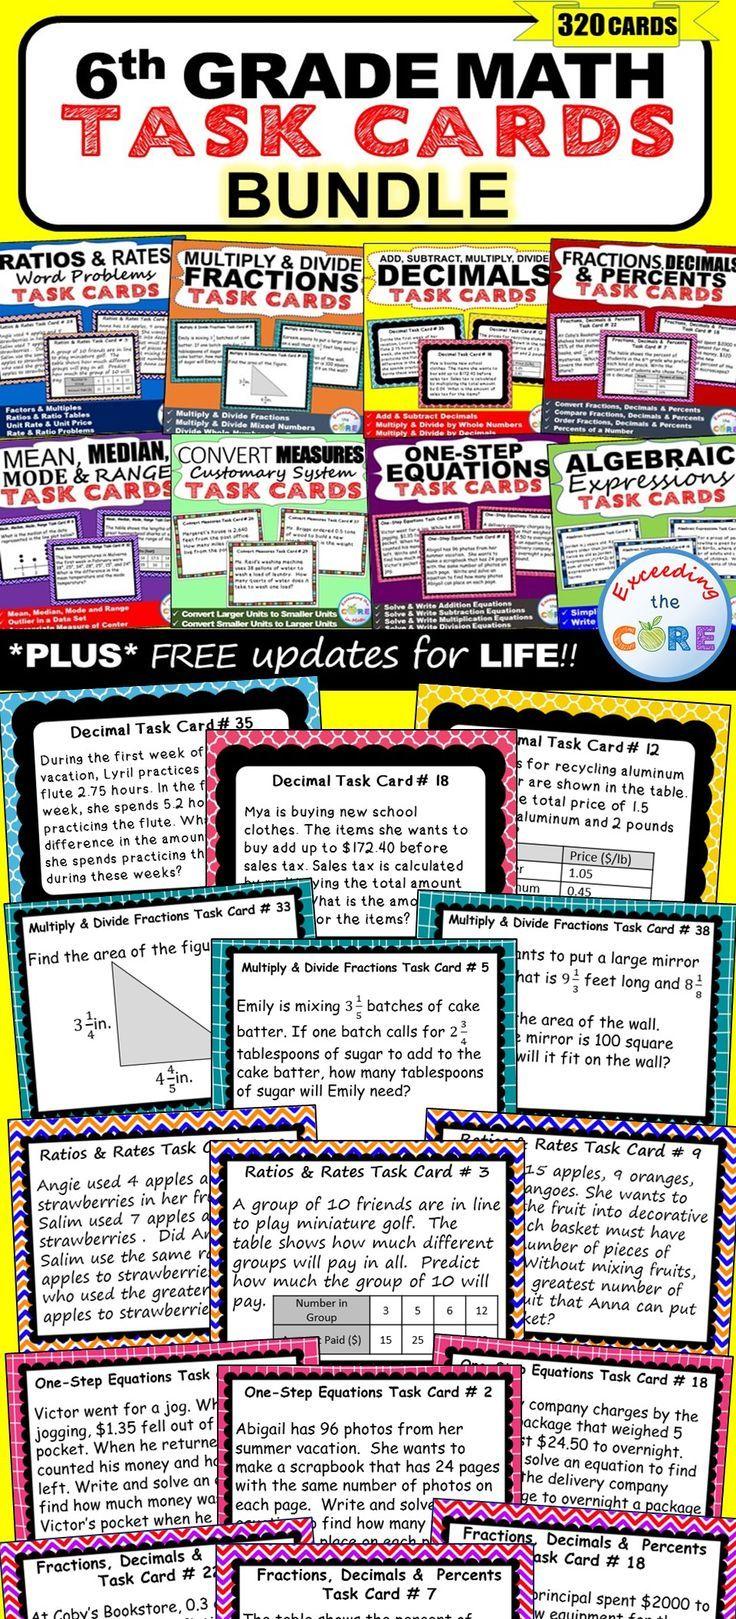 6th Grade Task Cards Bundlemon Core {320 Cards Skills Practice & Word  Problems }